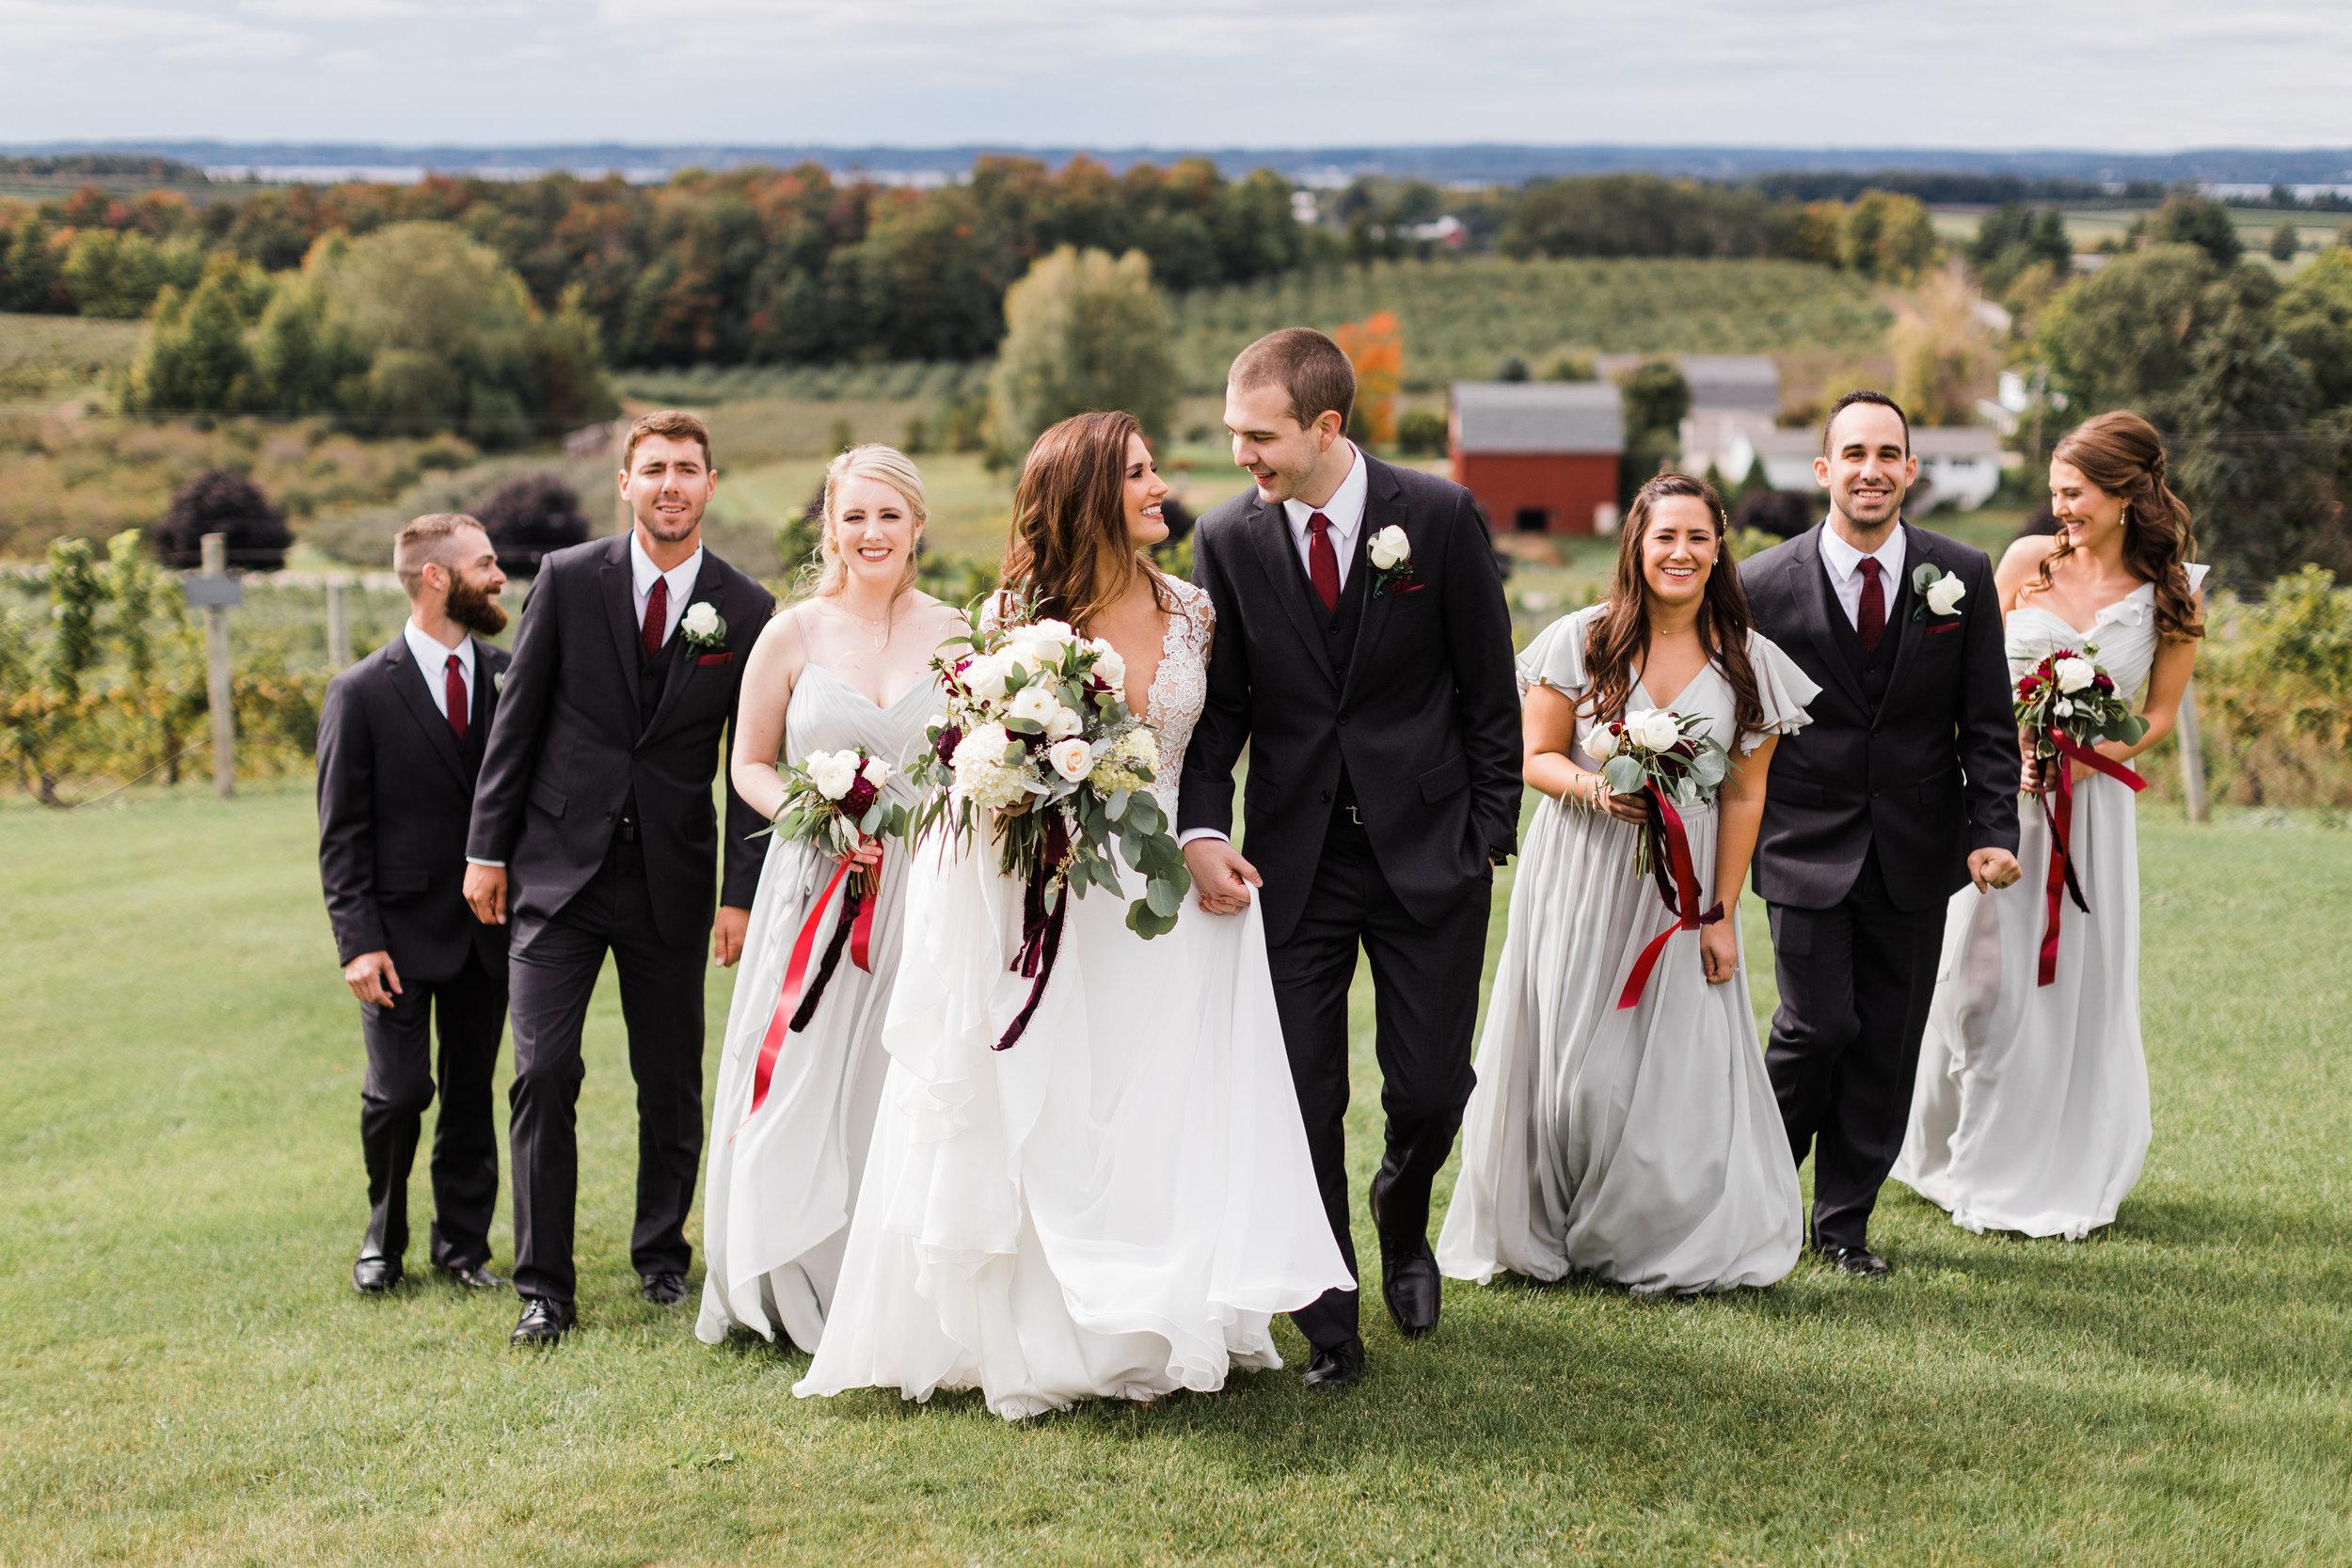 traverse_city_wedding_photographer_rockhill_chateau_chantal_vineyard_jr1.jpg